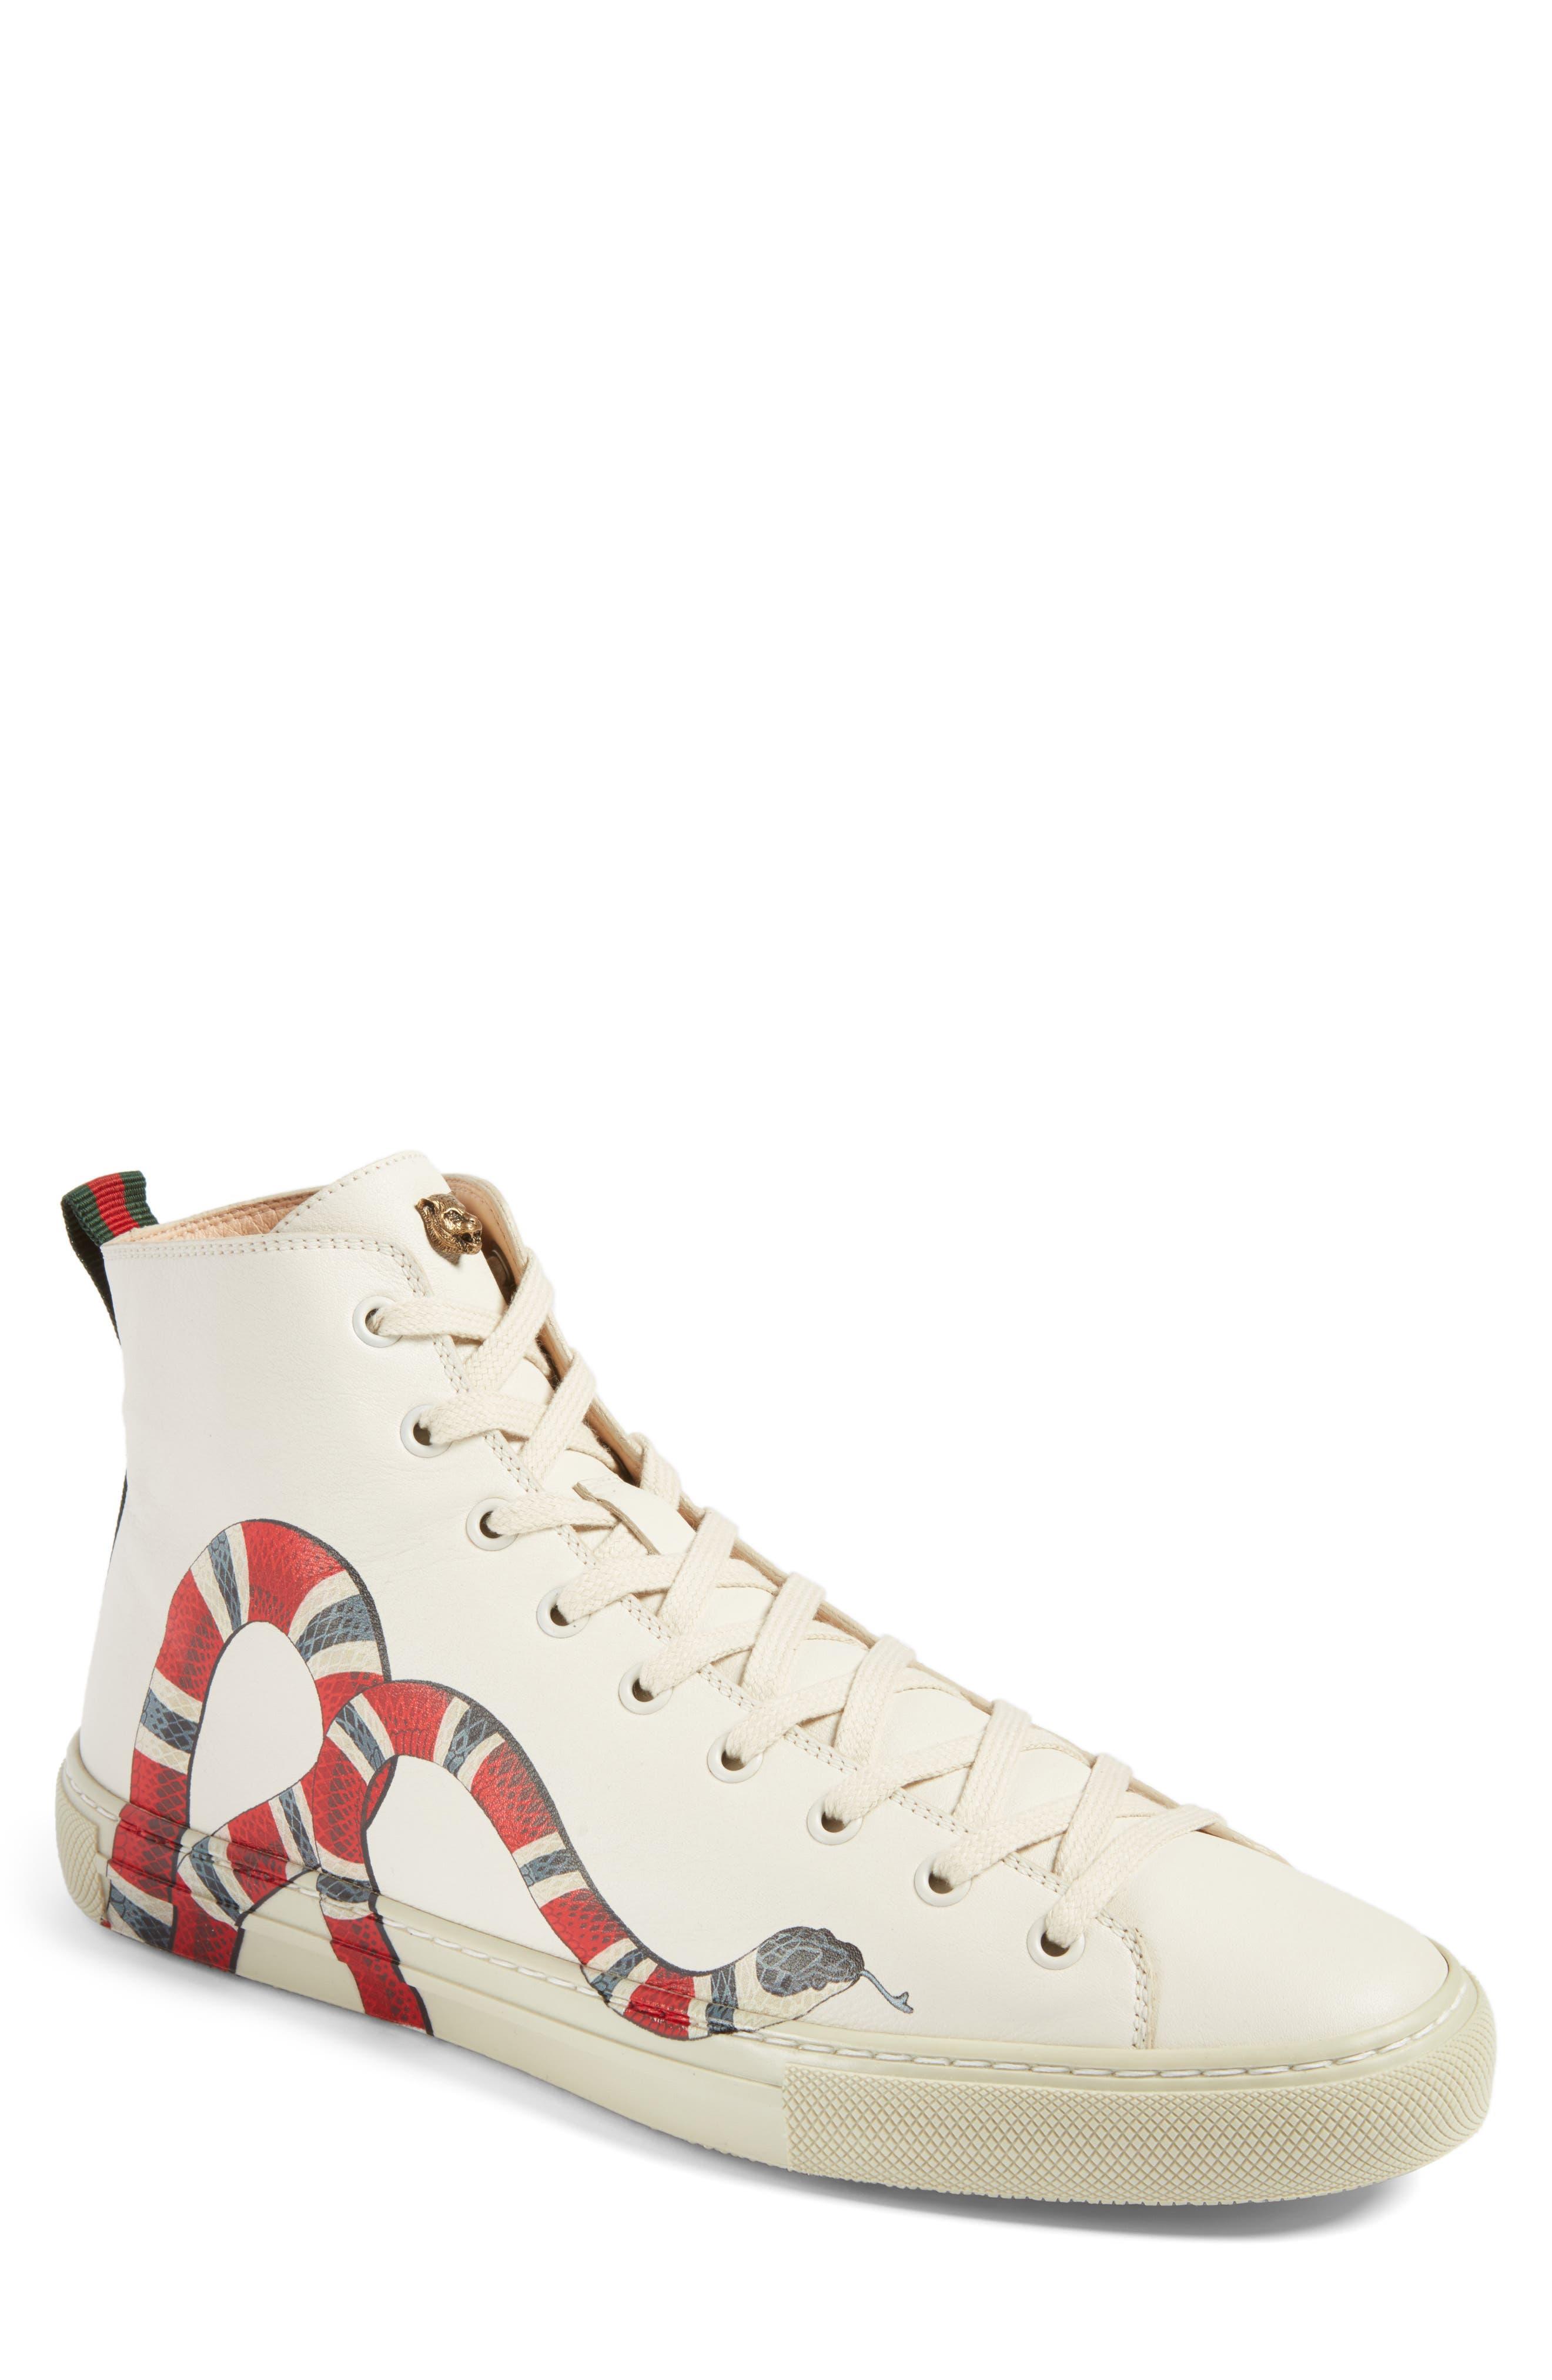 Gucci Major High Top Sneaker (Men)